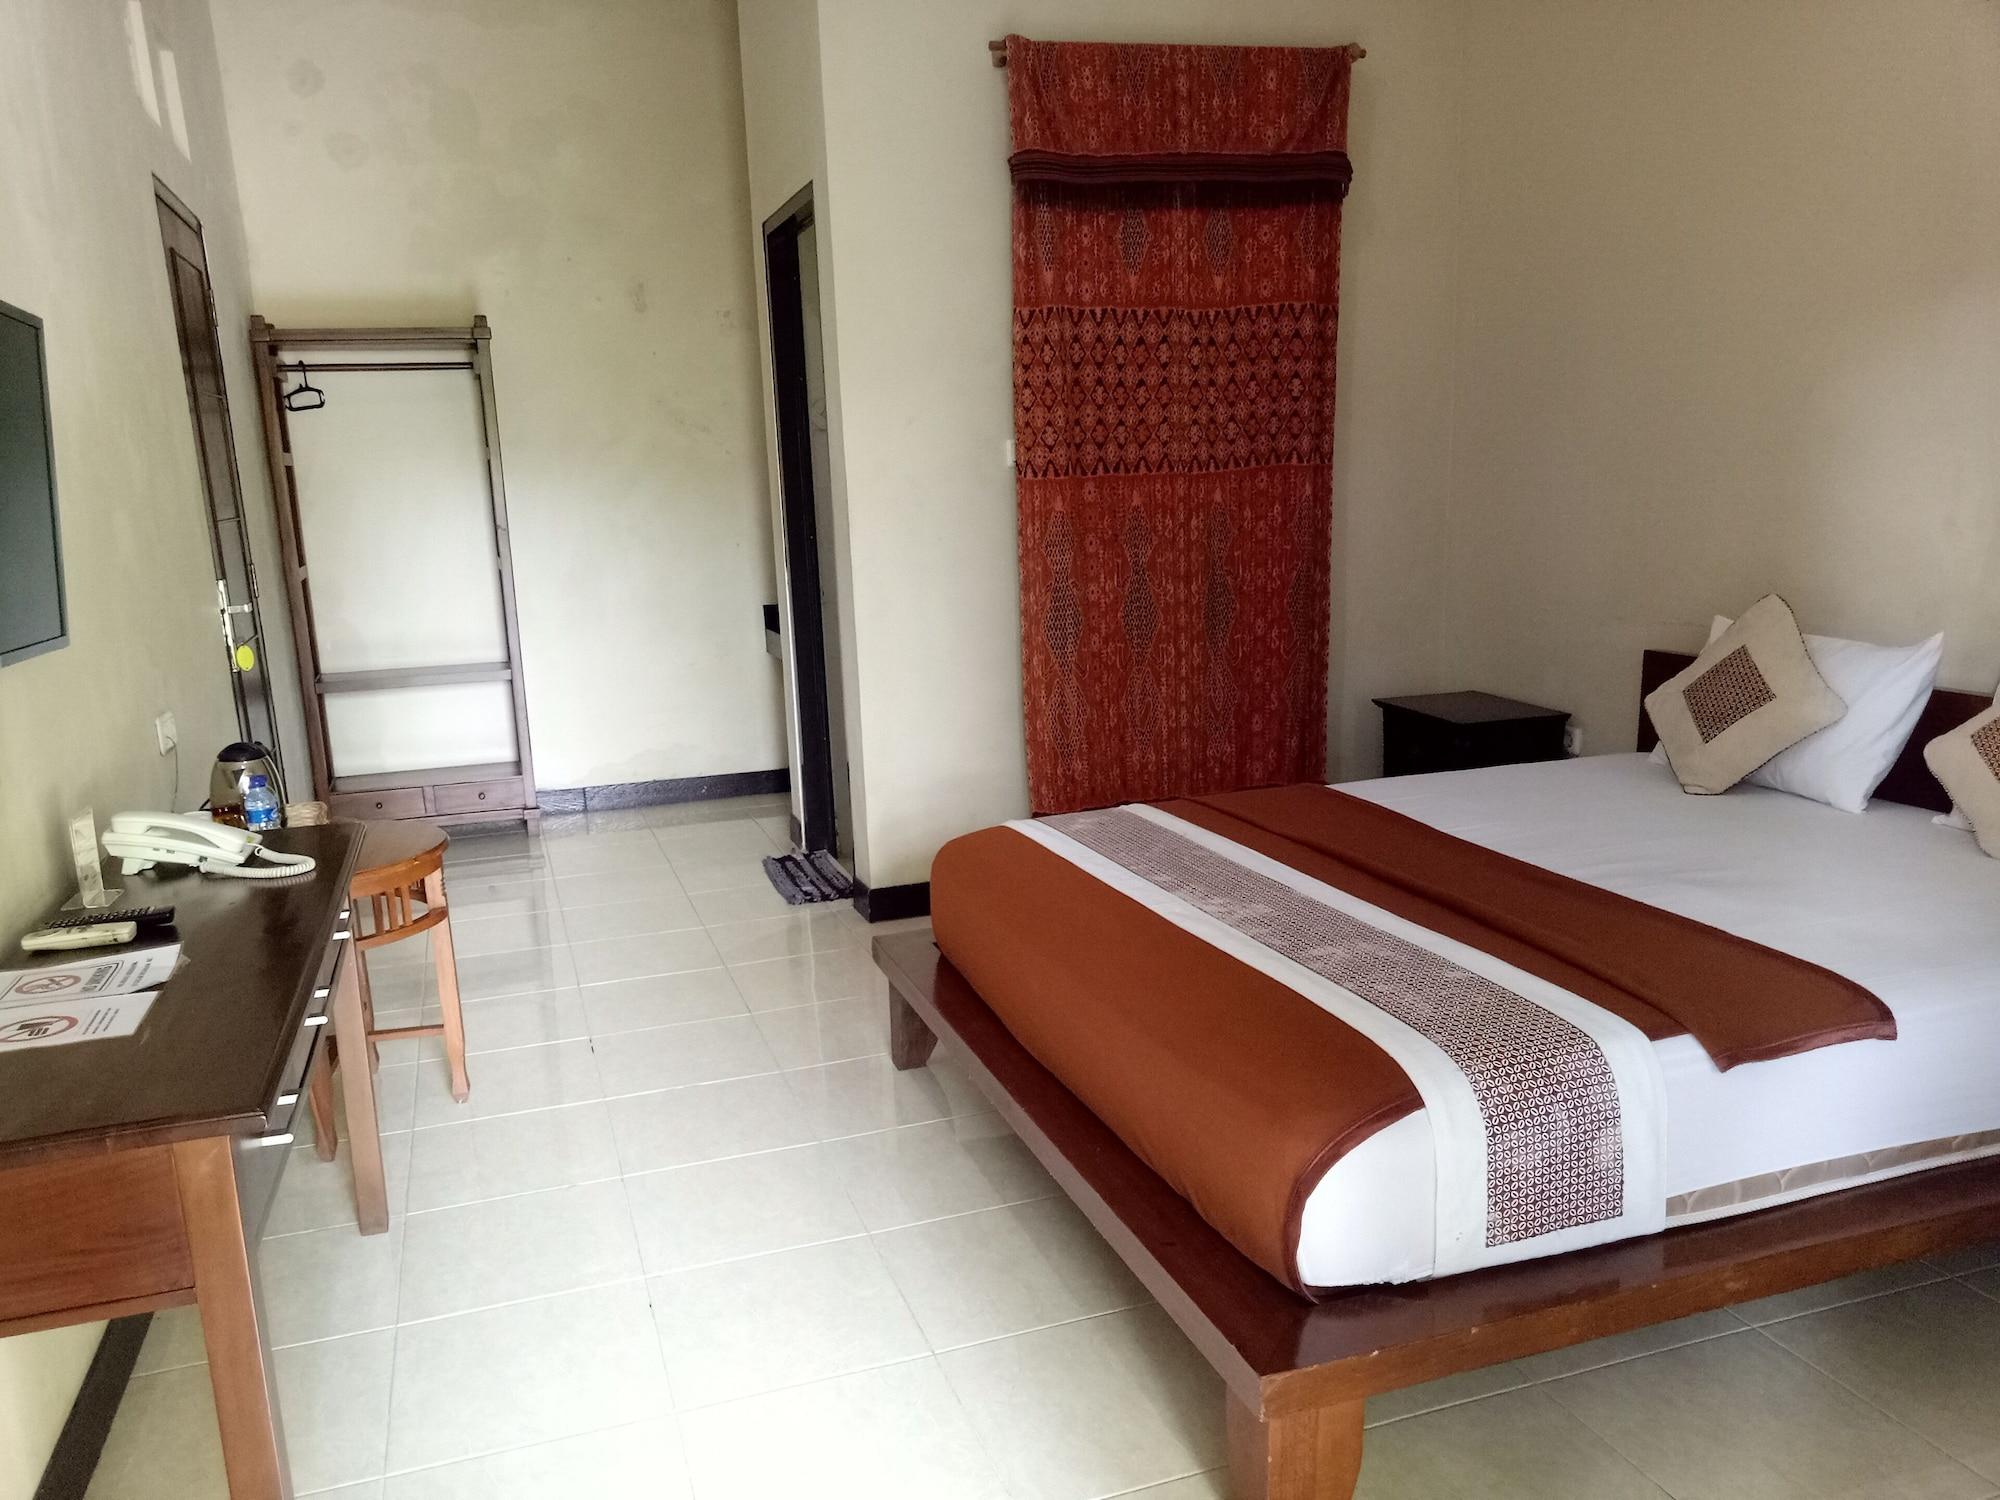 REVIVE Bogor Pendopo 45 Resort, Bogor